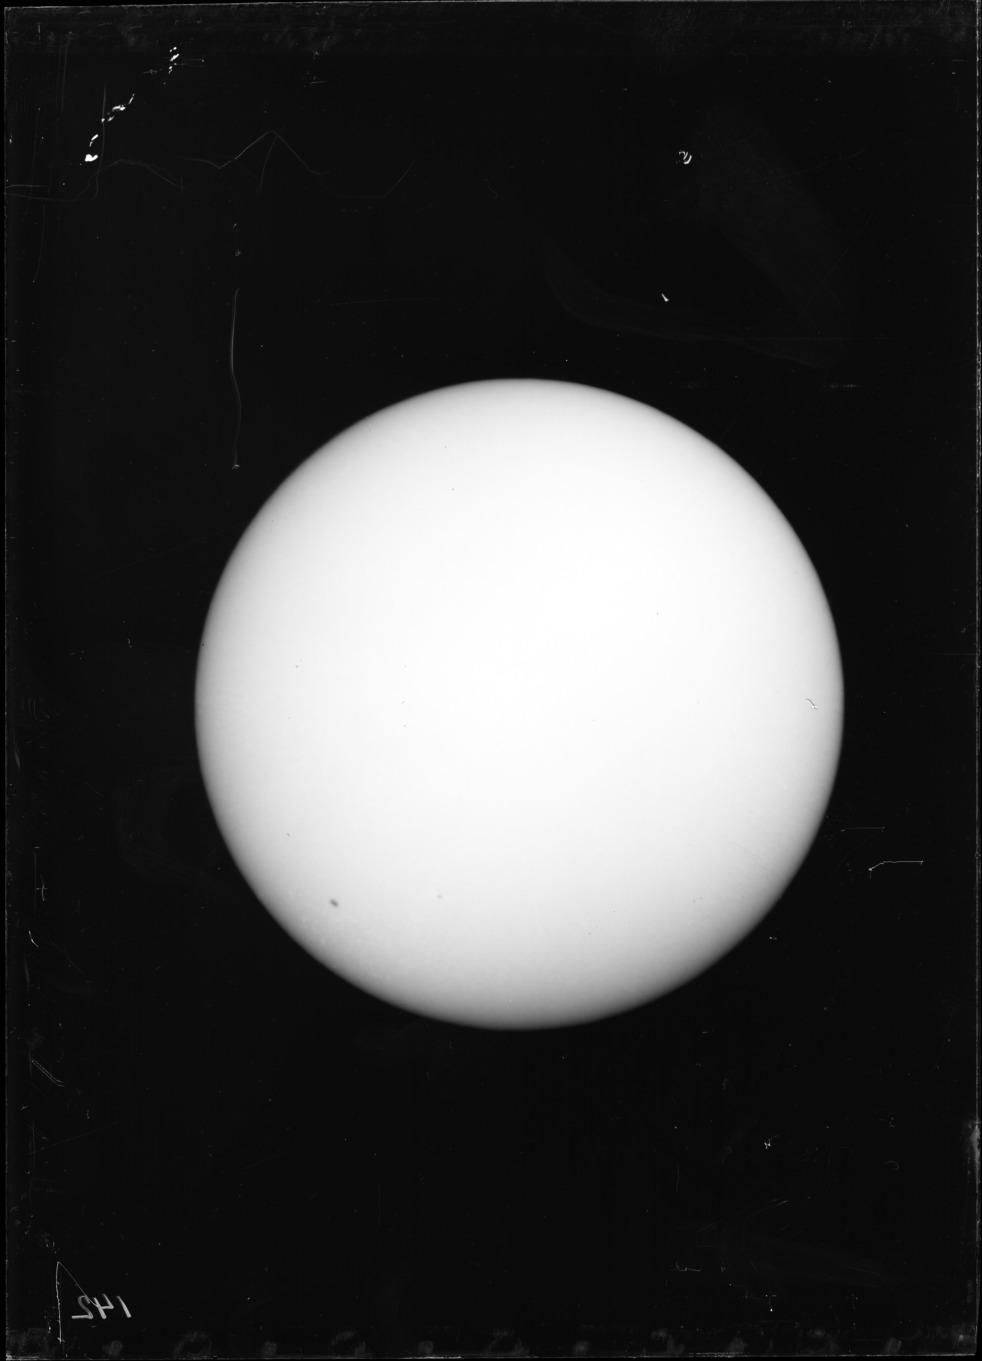 AGlV142